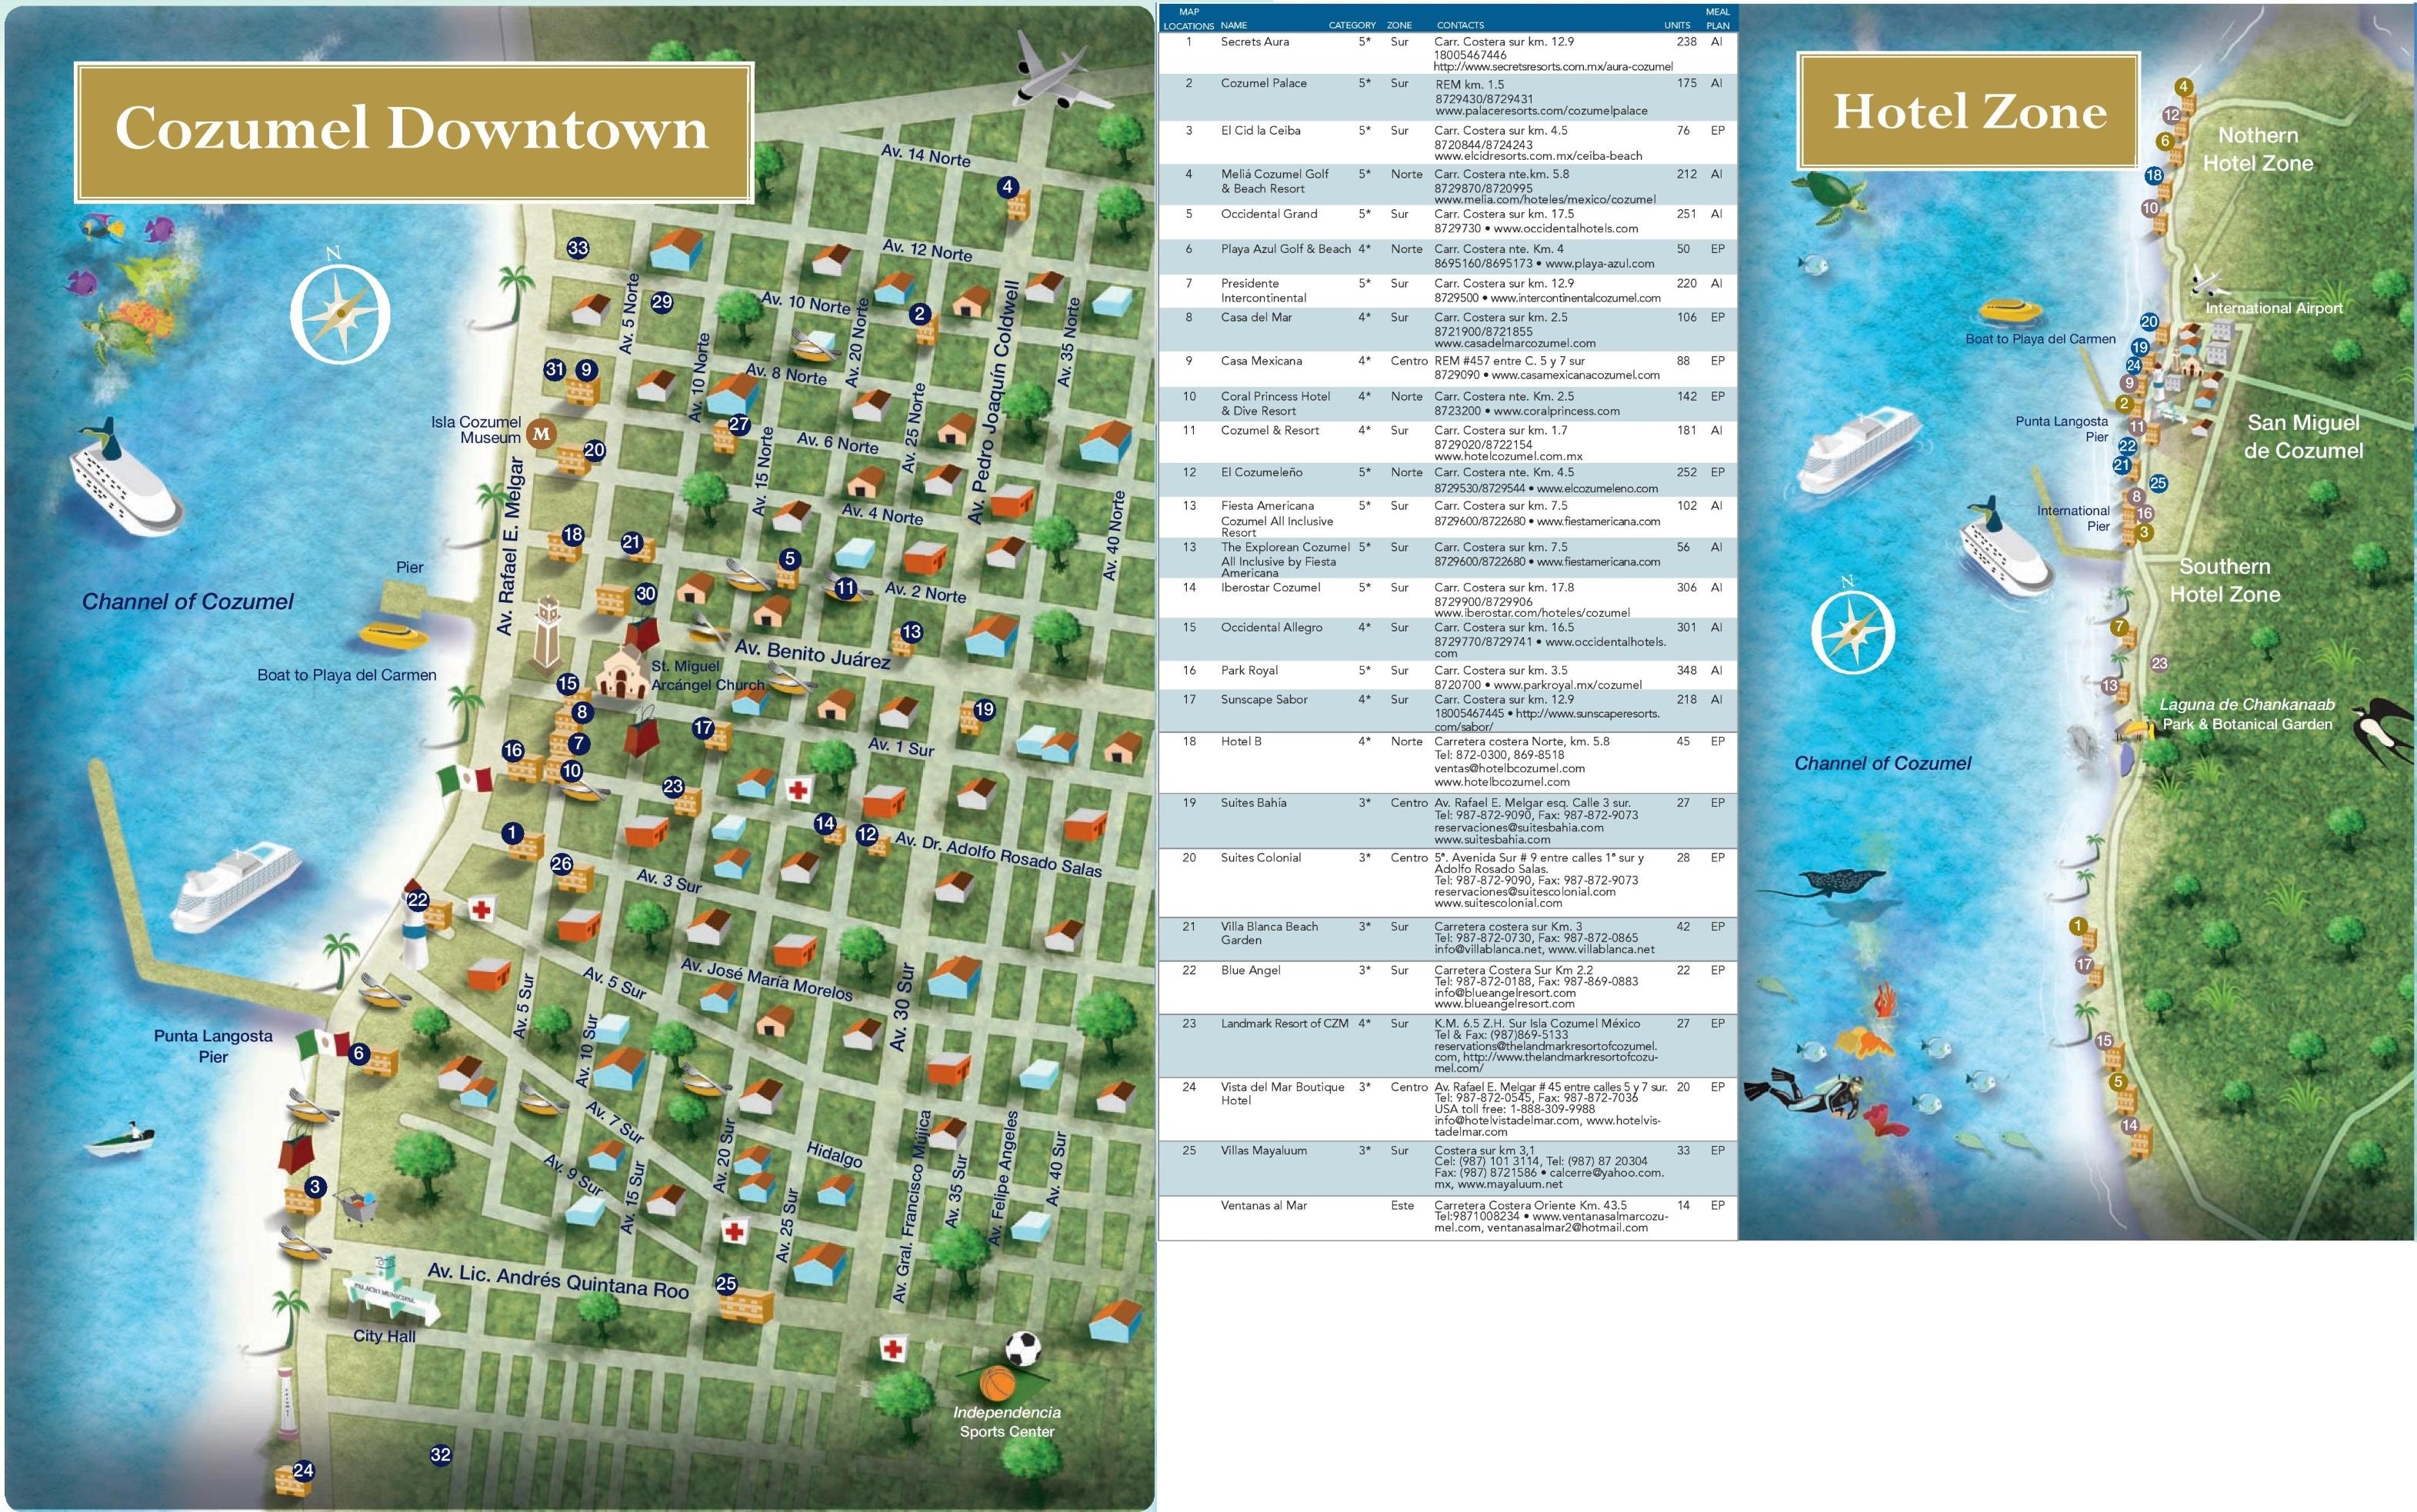 Cozumel Hotel Map